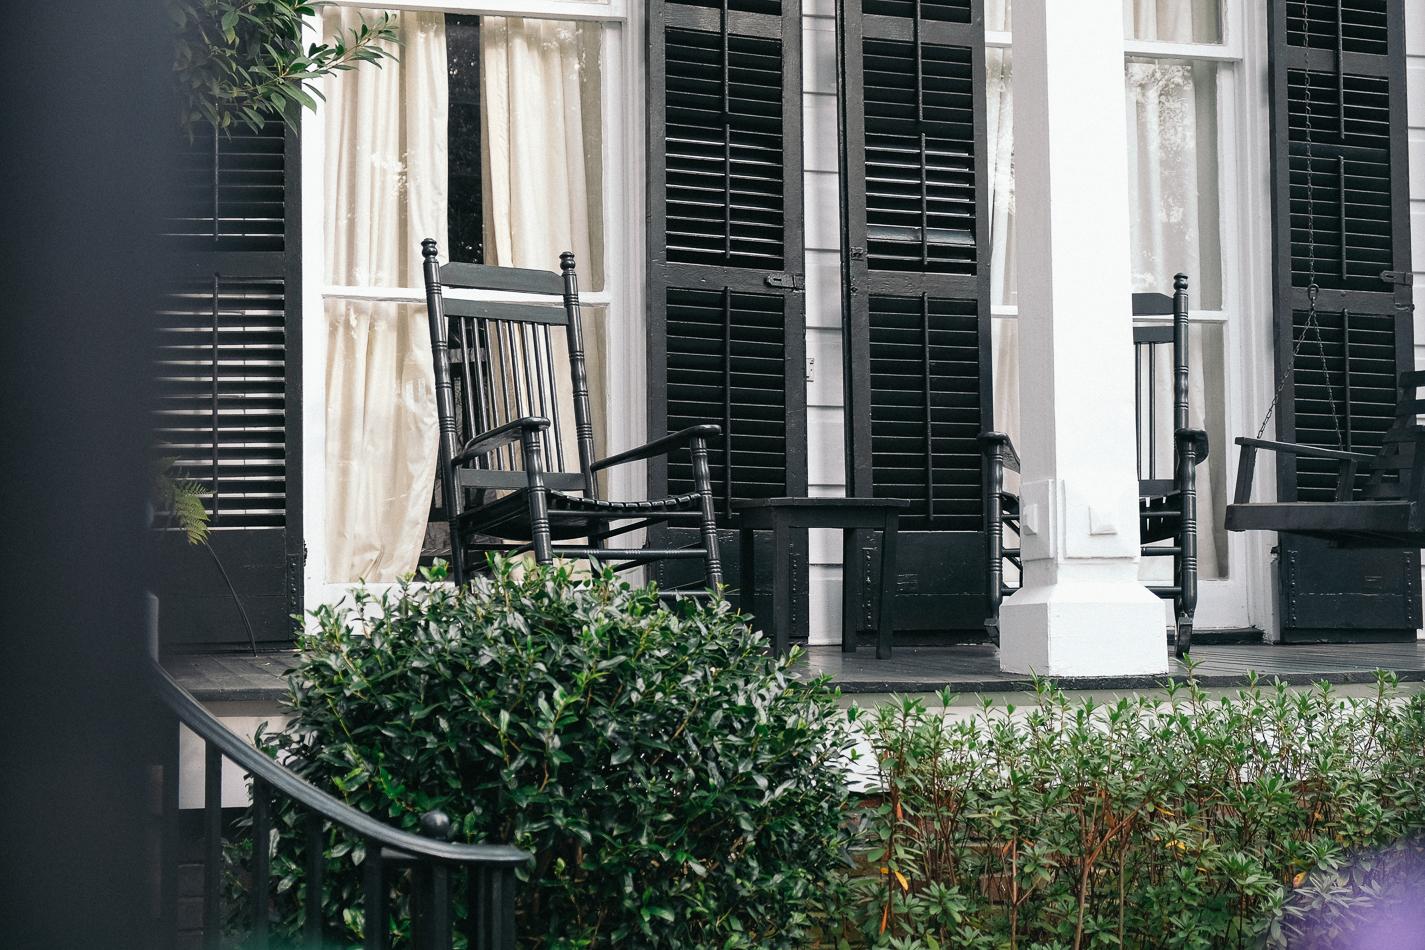 New_Orleans_dog_Friendly_travel_guide-5865.jpg